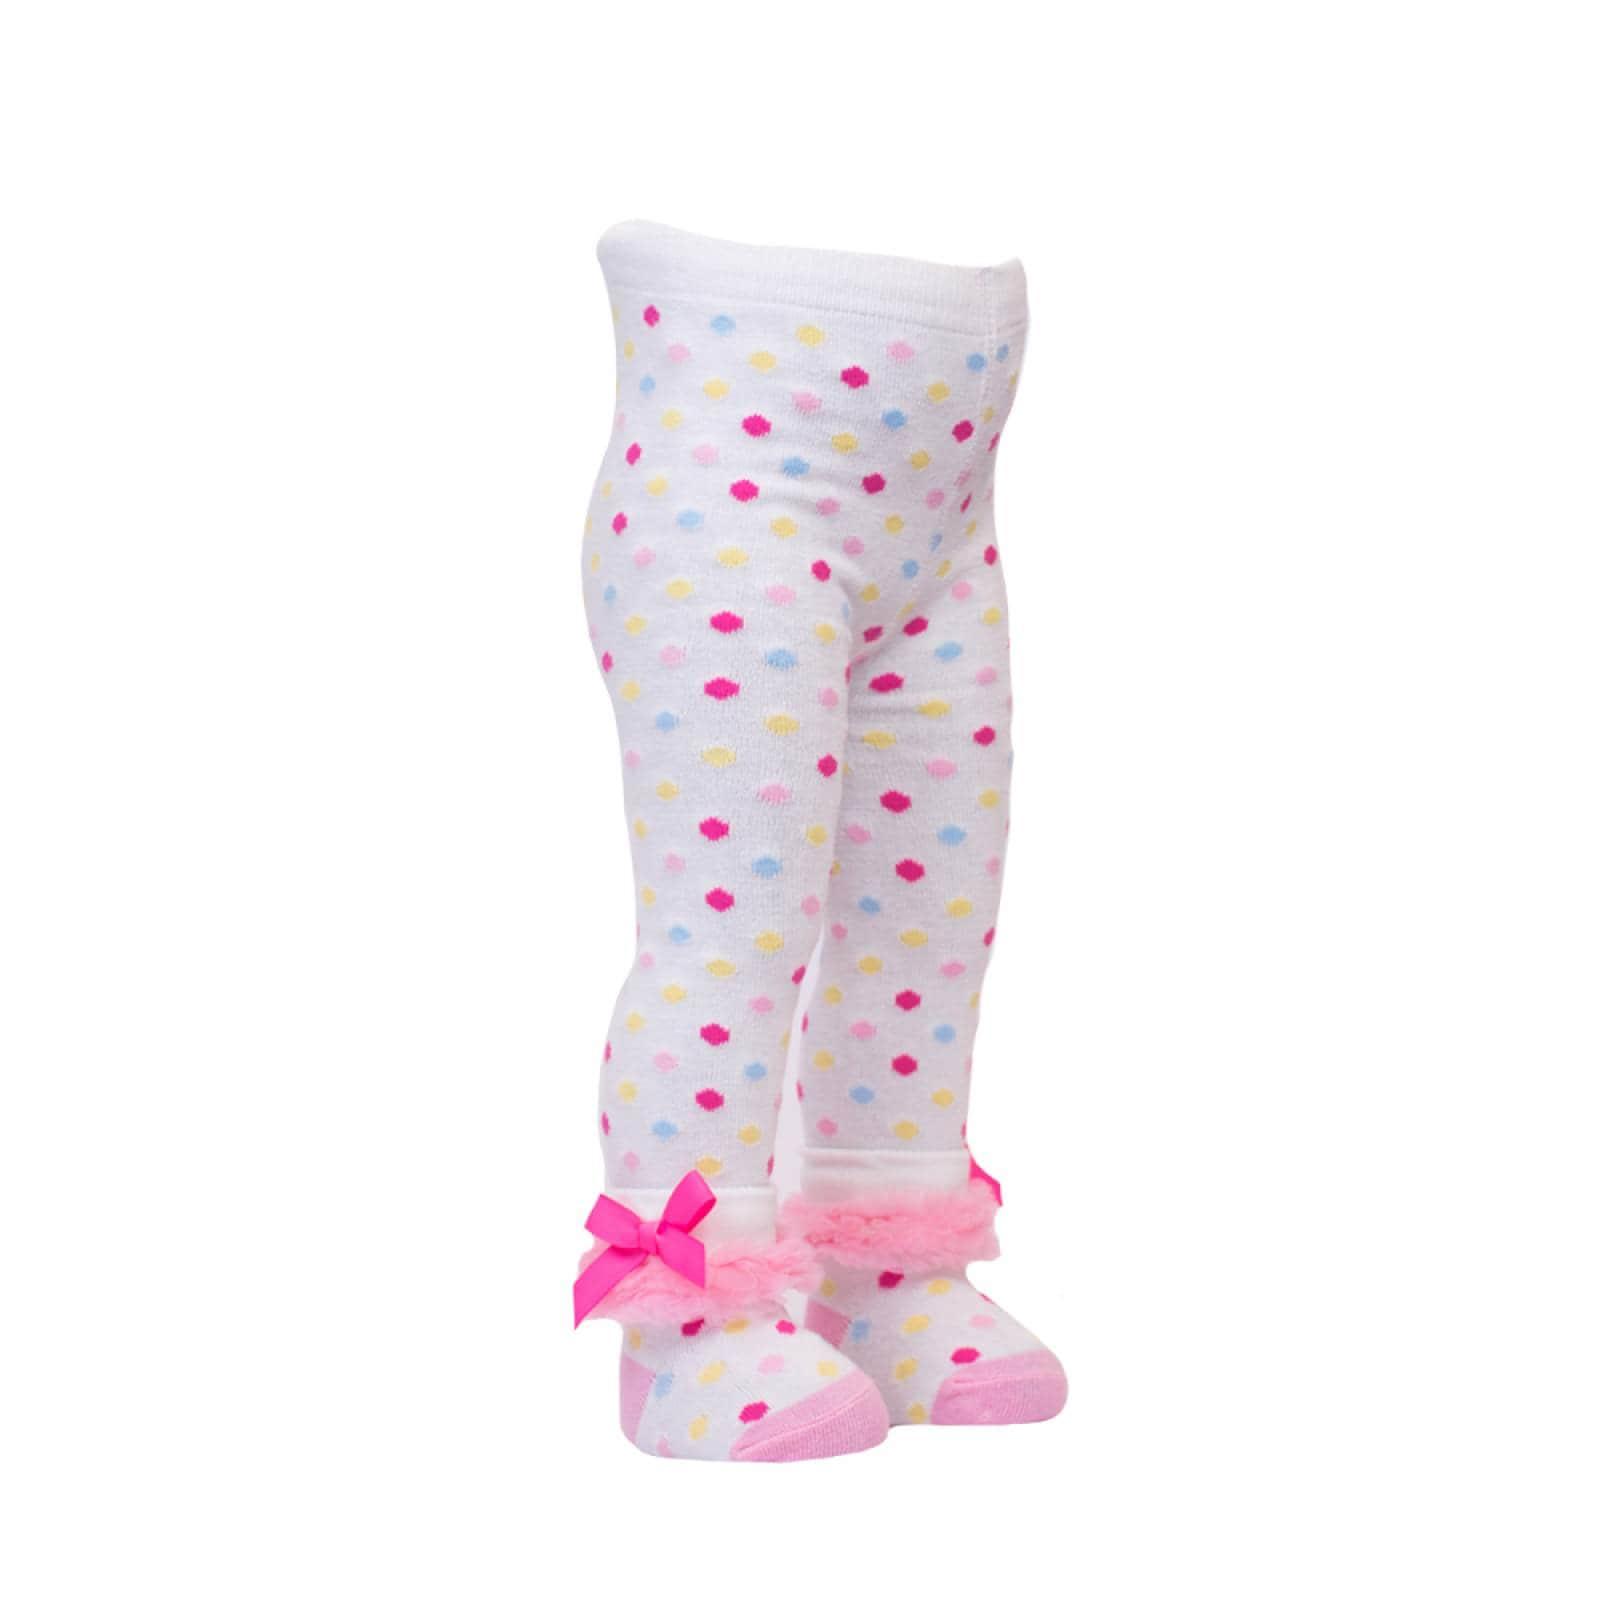 Legging Lunares Olan Tobillo algodón Azul 24-36 Meses Baby Room